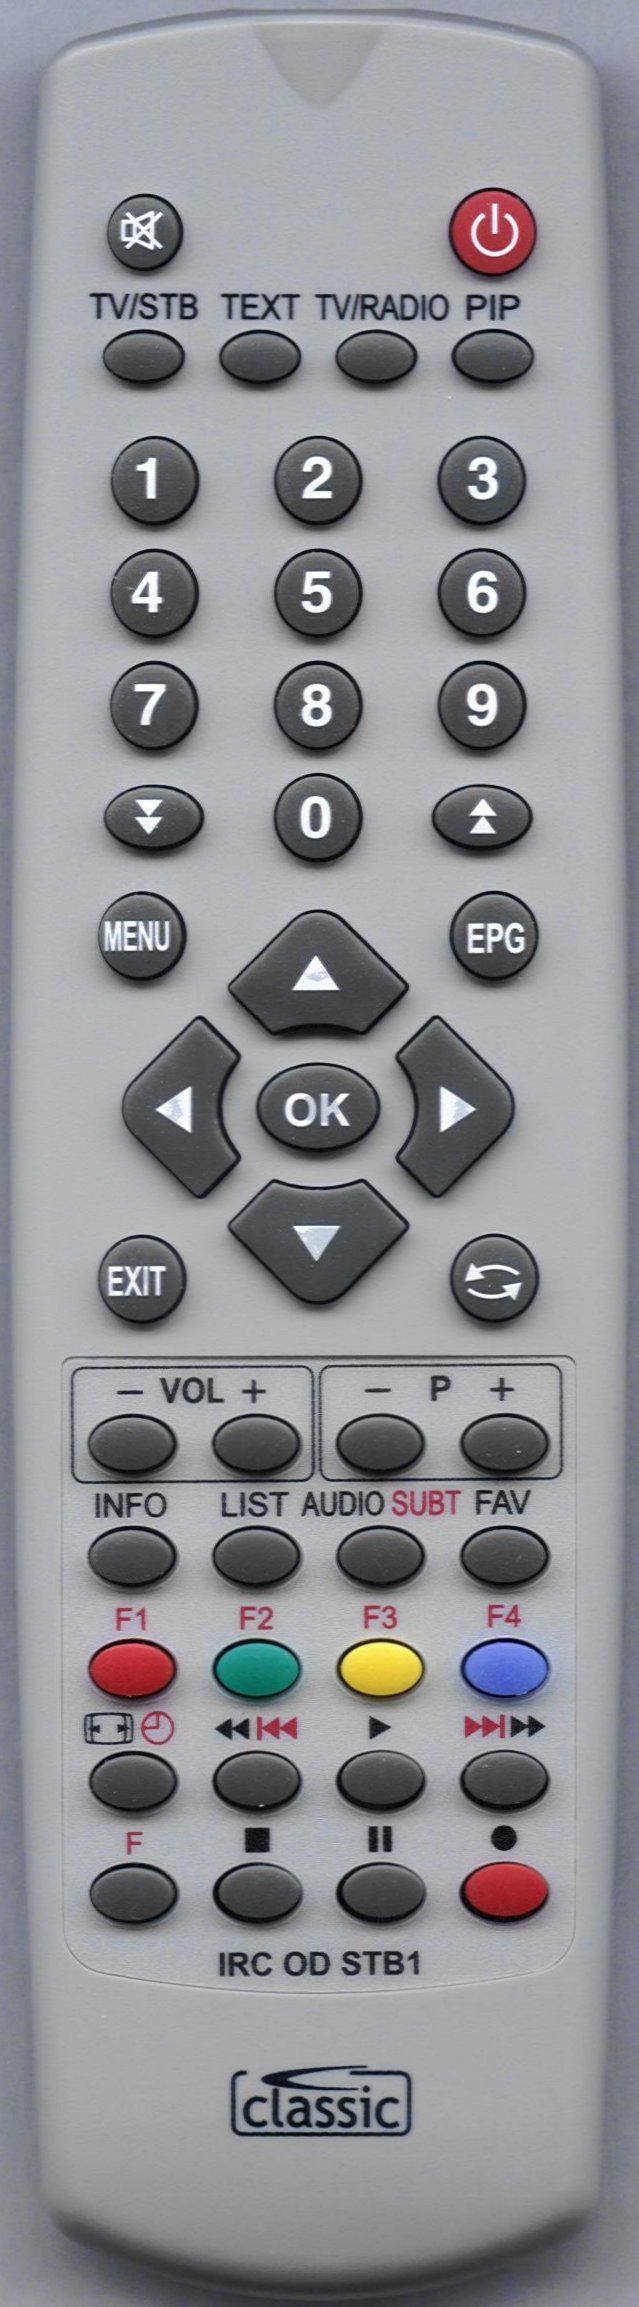 Topfield TP-304 B Remote Control